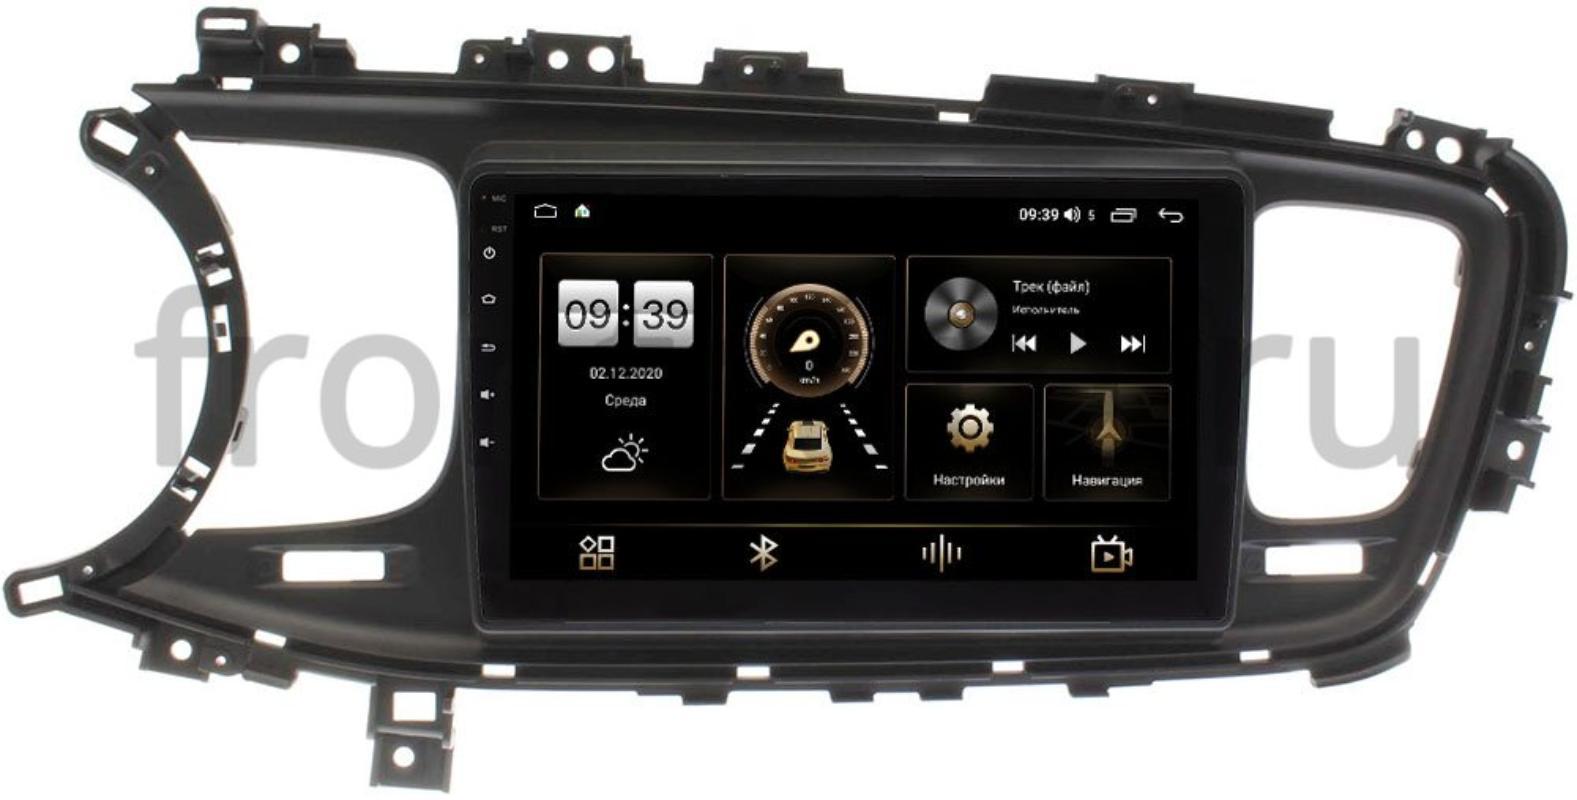 Штатная магнитола Kia Optima III 2013-2015 LeTrun 4166-9-471 на Android 10 (4G-SIM, 3/32, DSP, QLed) (+ Камера заднего вида в подарок!)